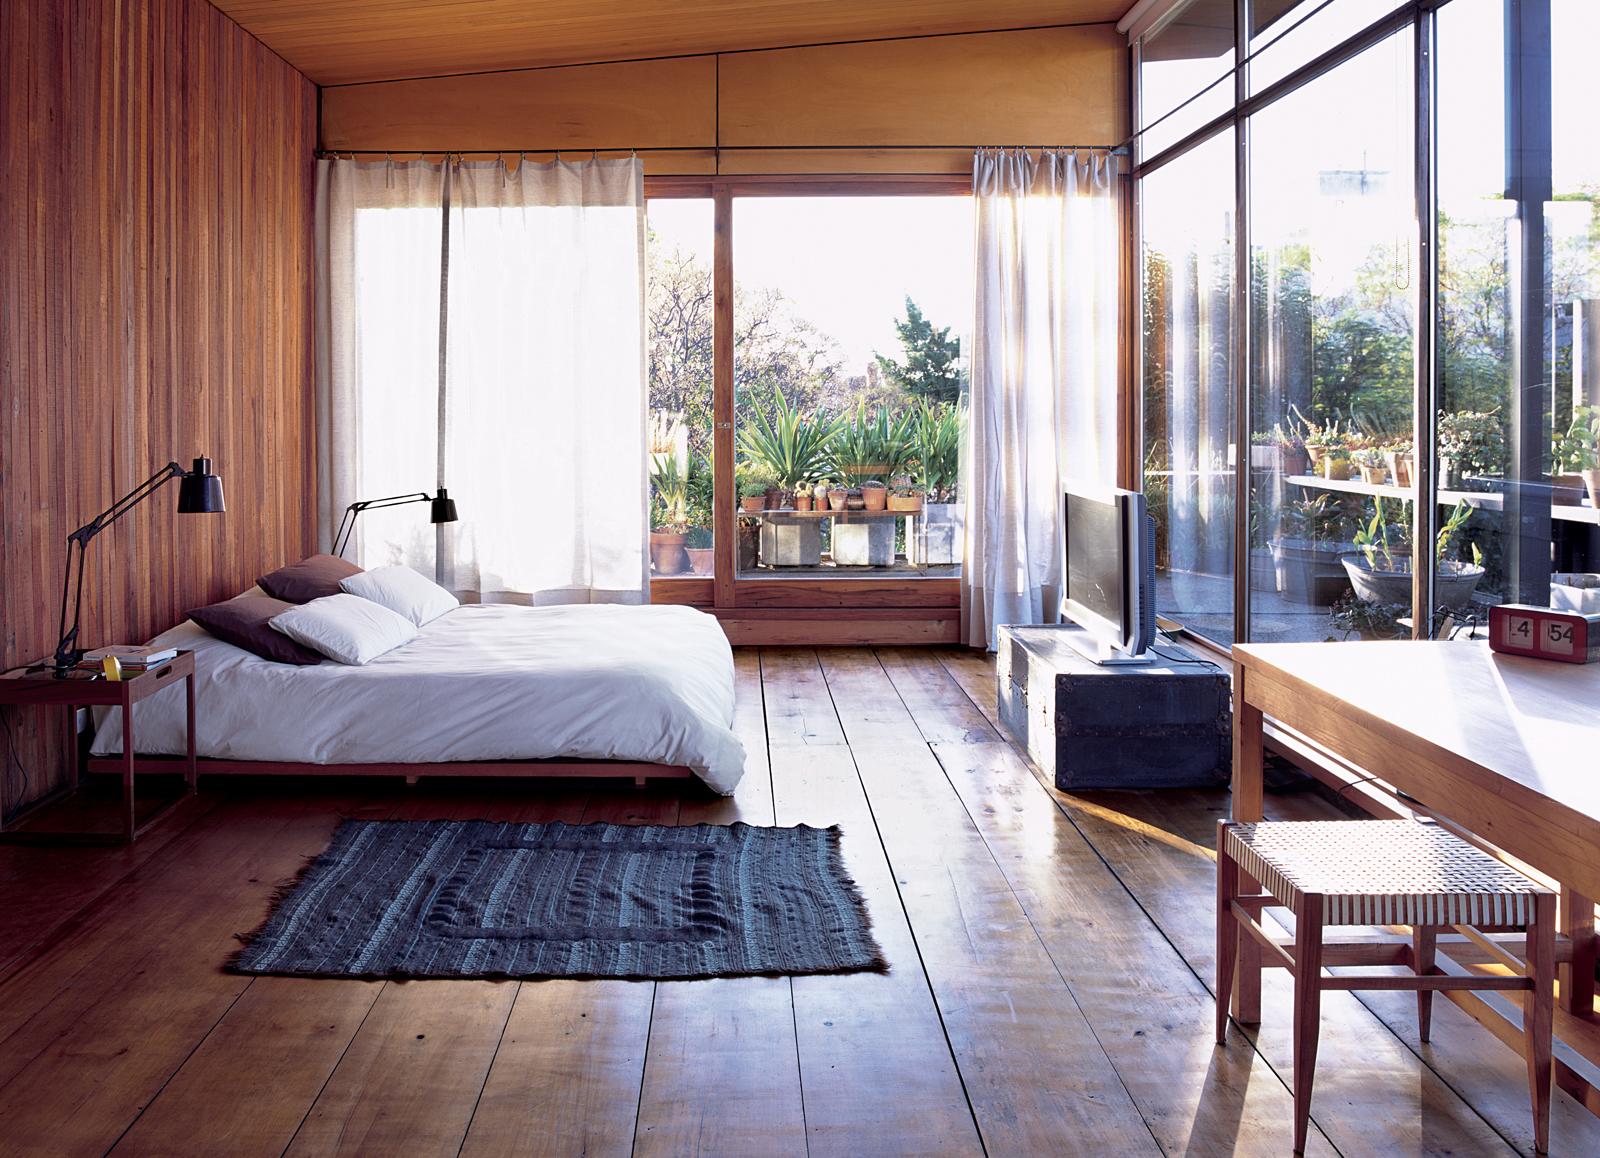 Sticottimaster bedroom. Photo by Cristóbal Palma.